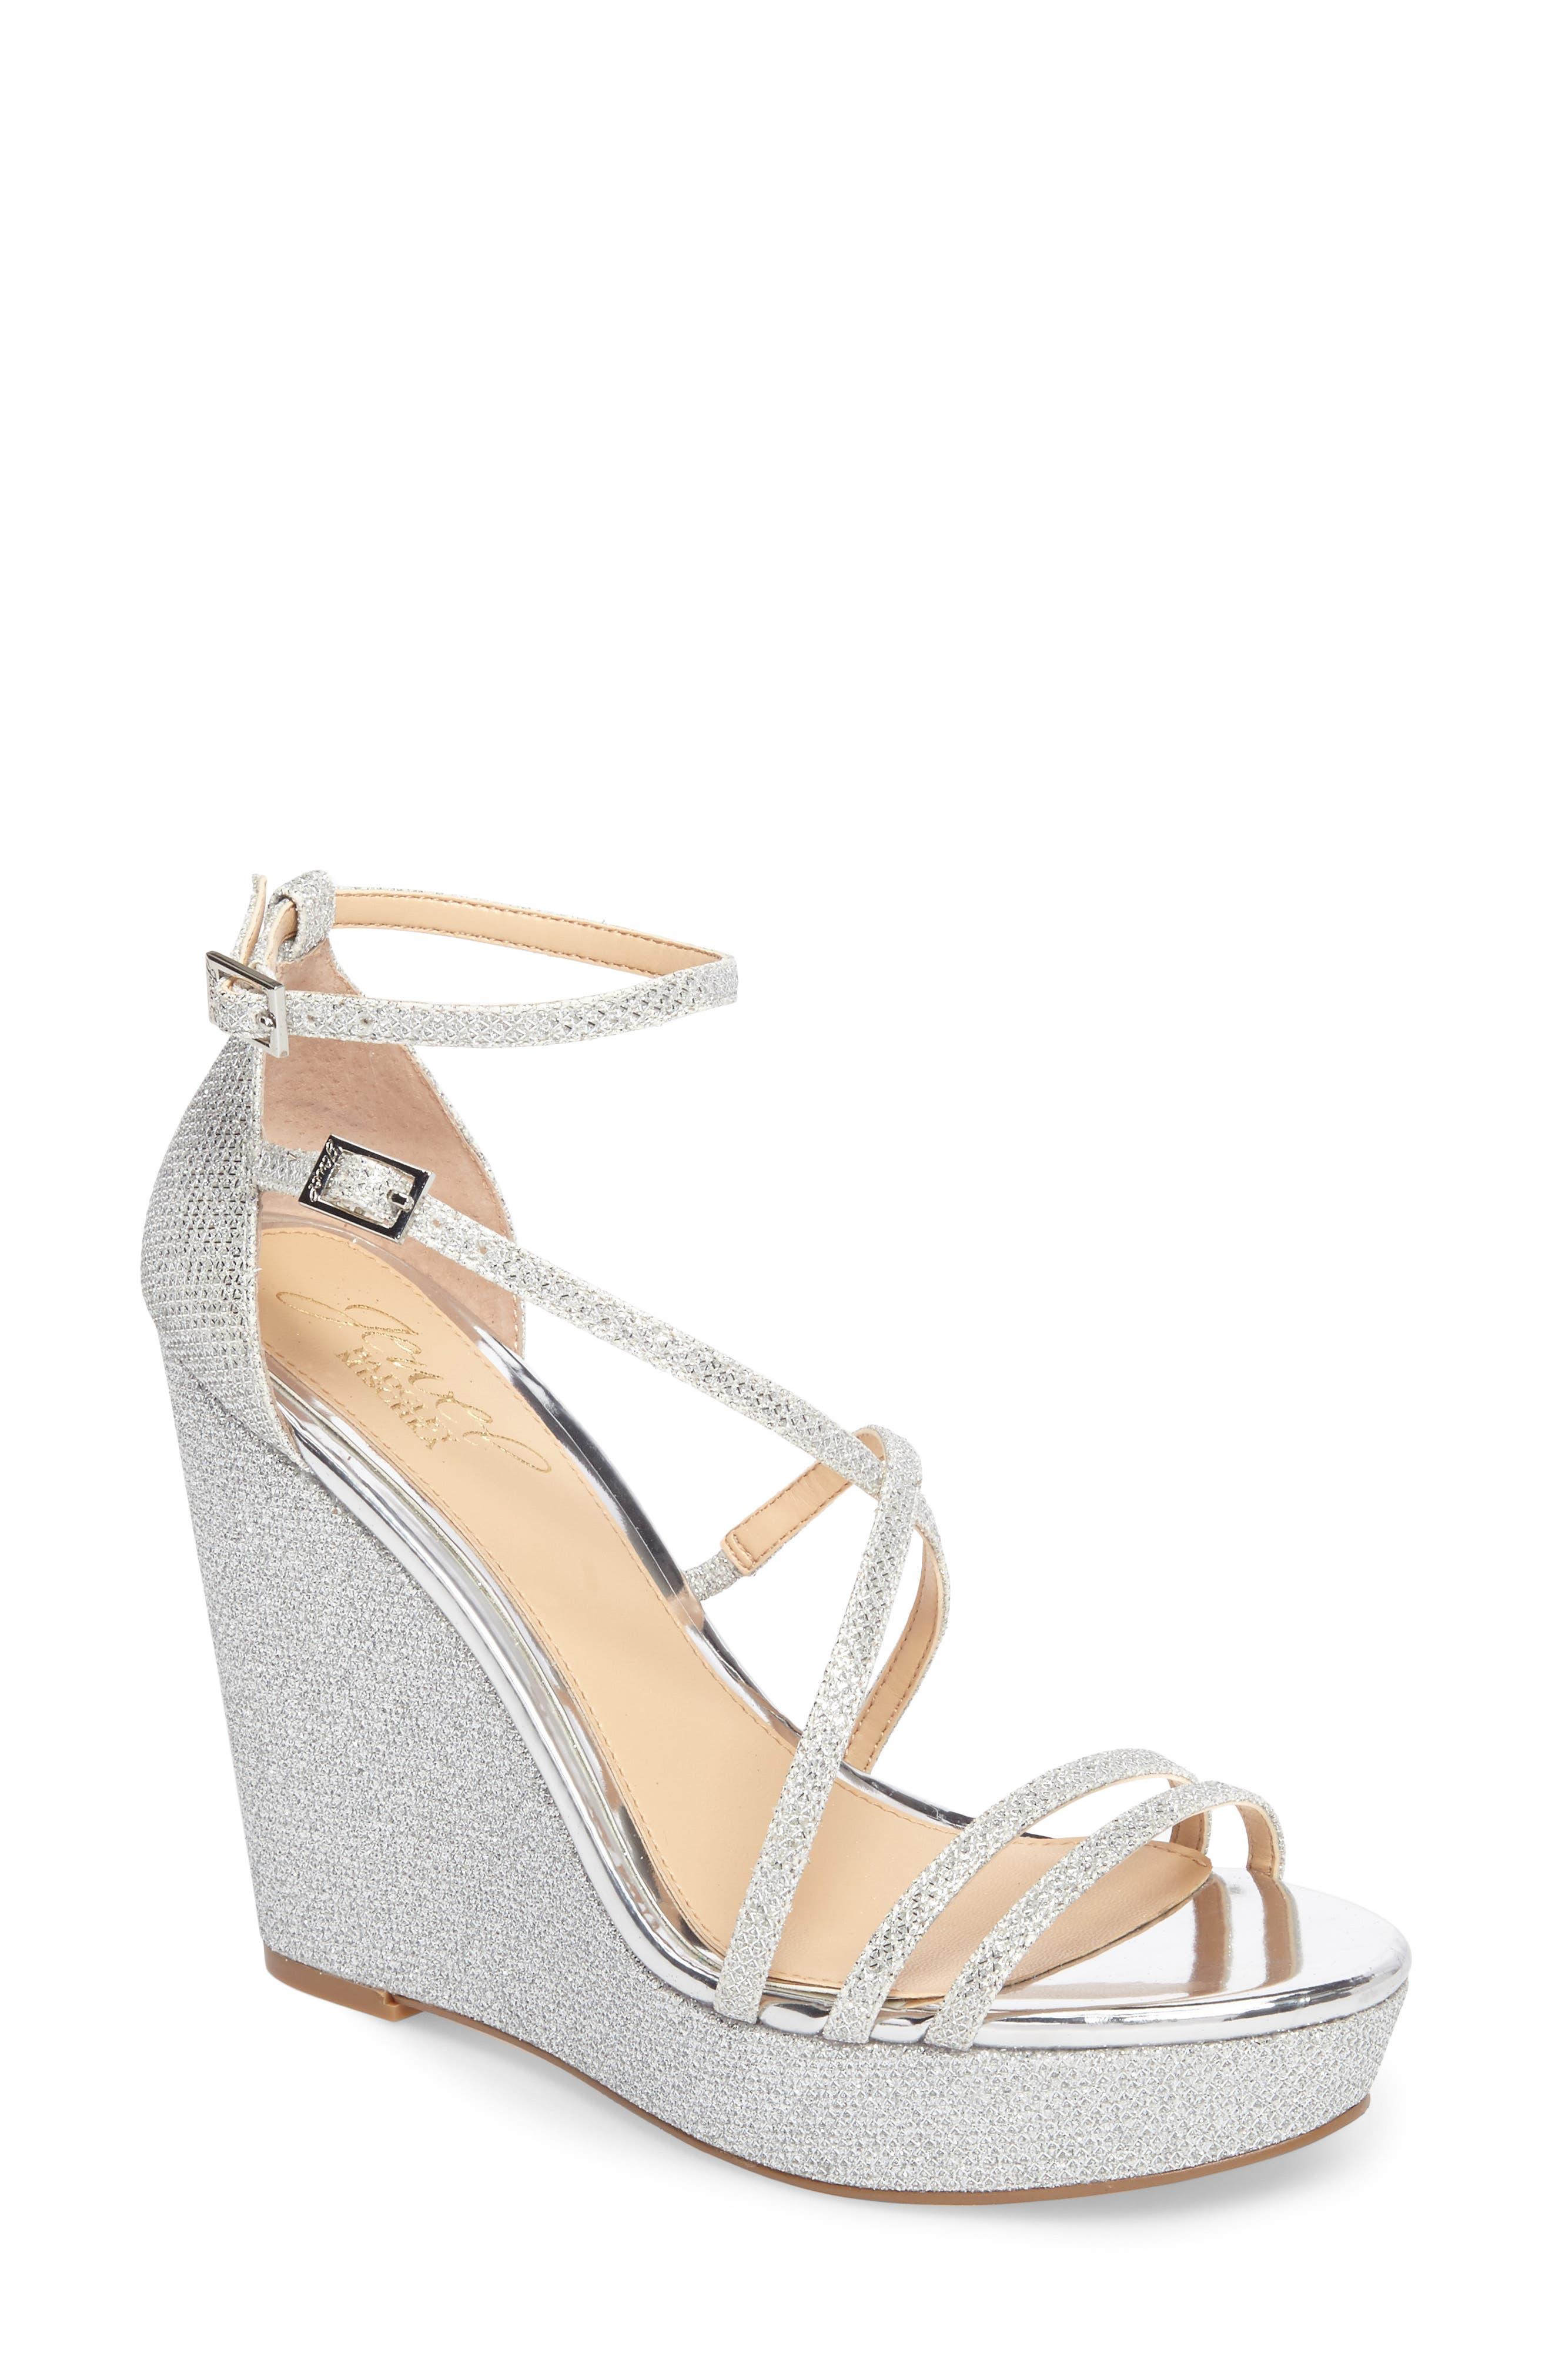 Tatsu Wedge Sandal,                             Main thumbnail 1, color,                             Silver Glitter